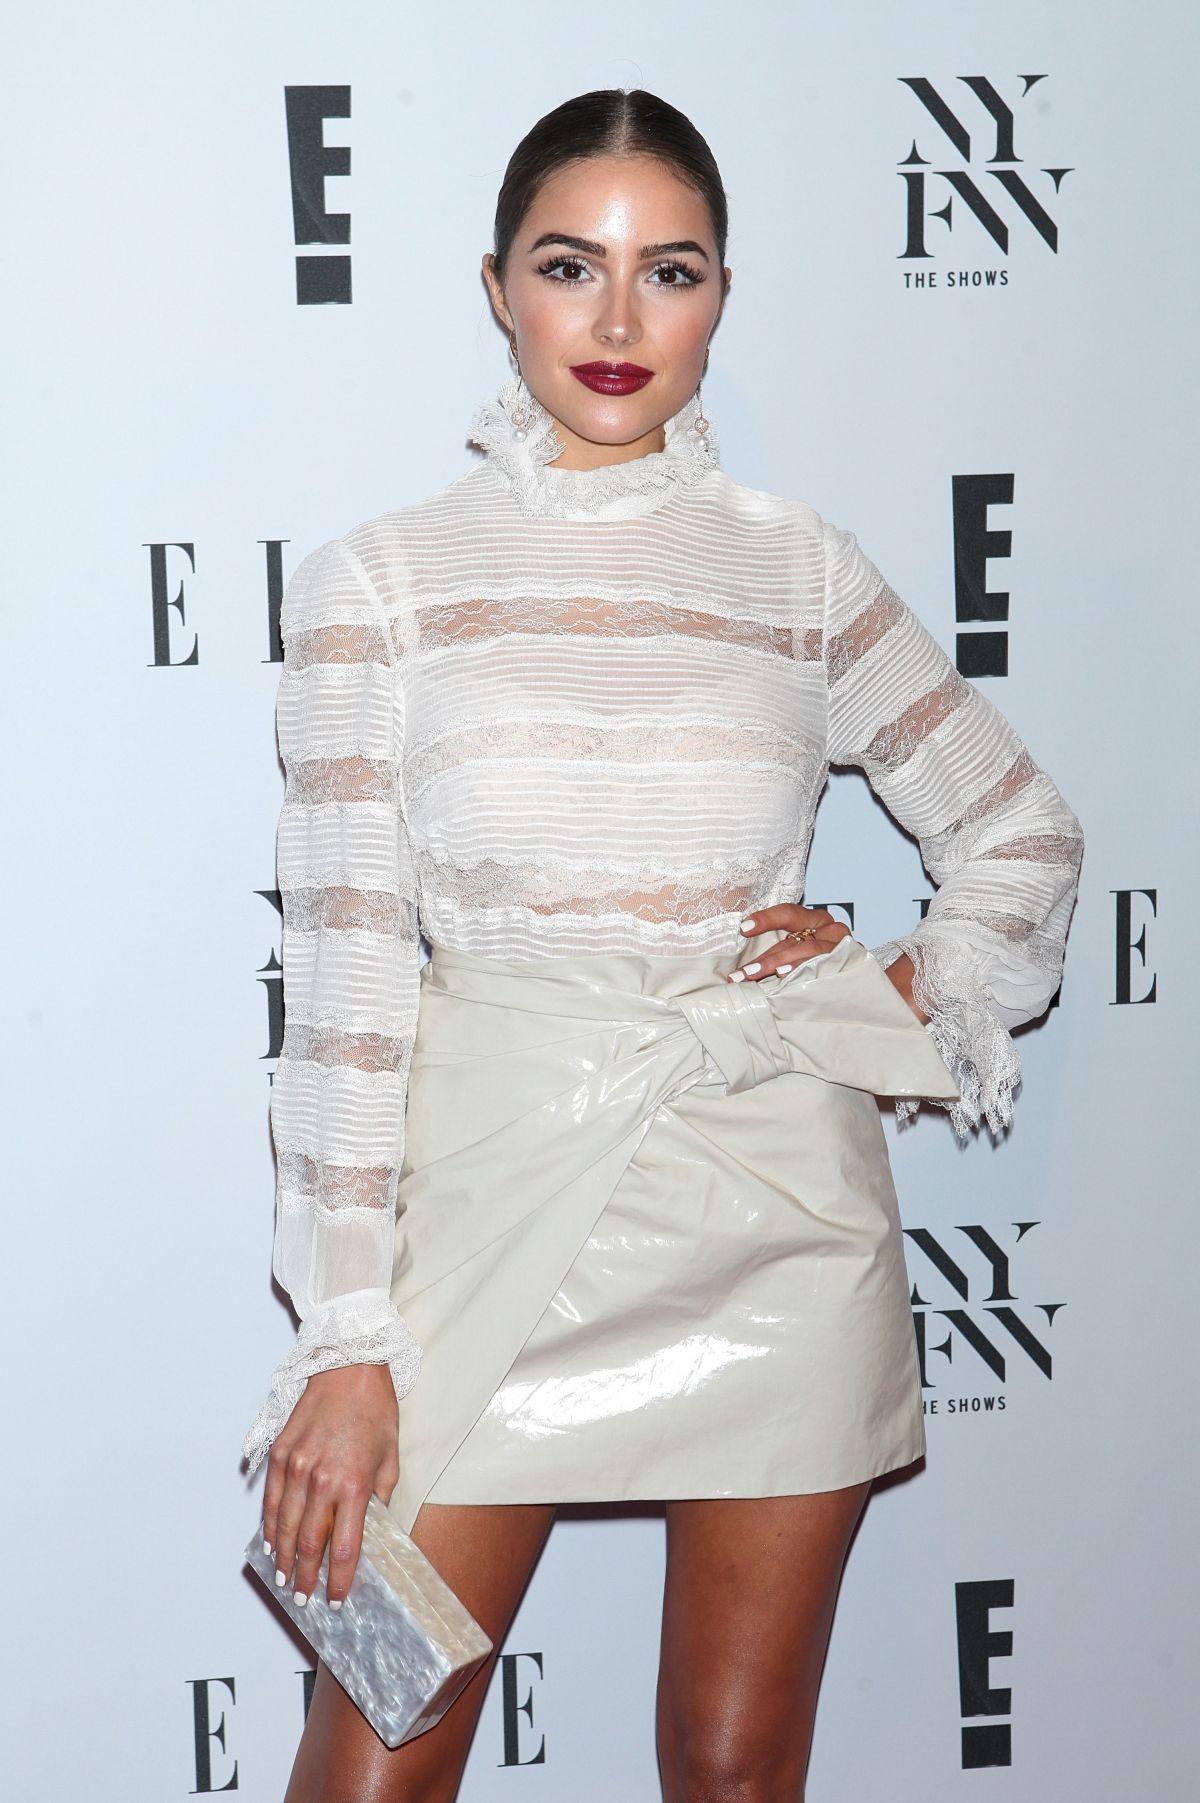 OLIVIA CULPO at E! New York Fashion Week Kick-off in New York 09/07/2016